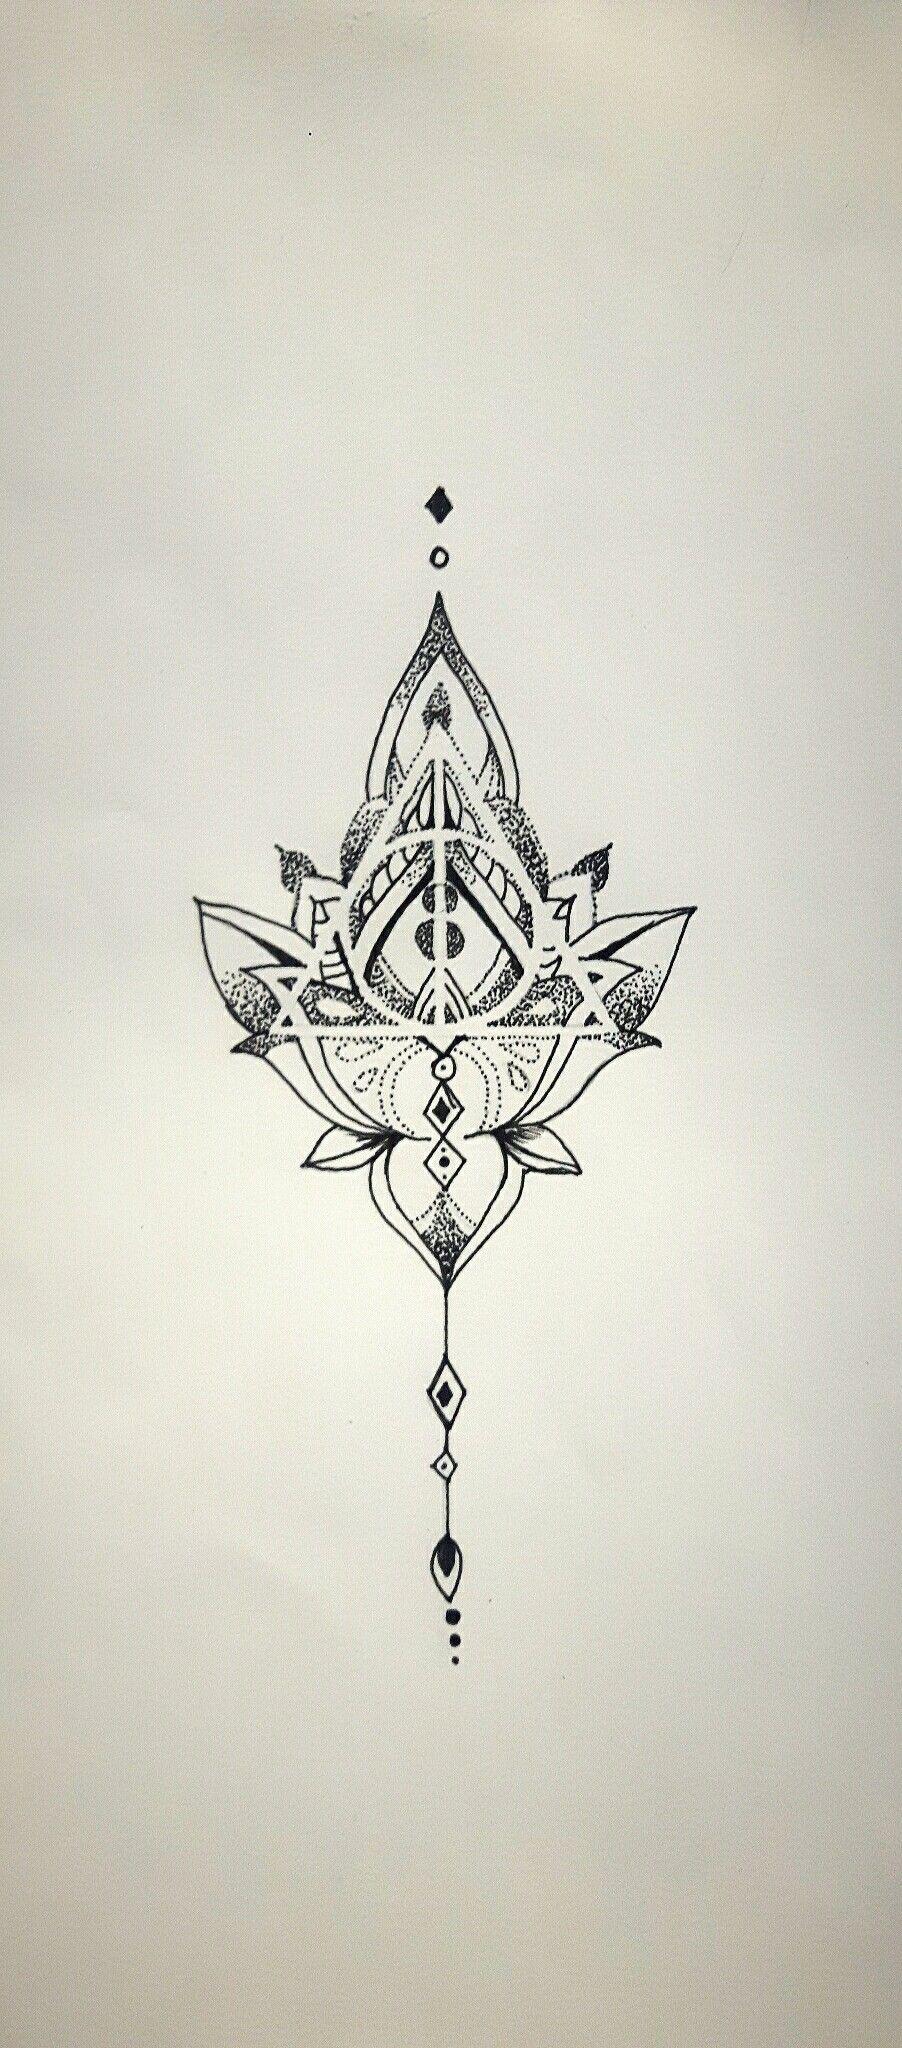 Mandala Deathly Hallows, tattoo idea. Own design Follow me on Insta @wlmscyn